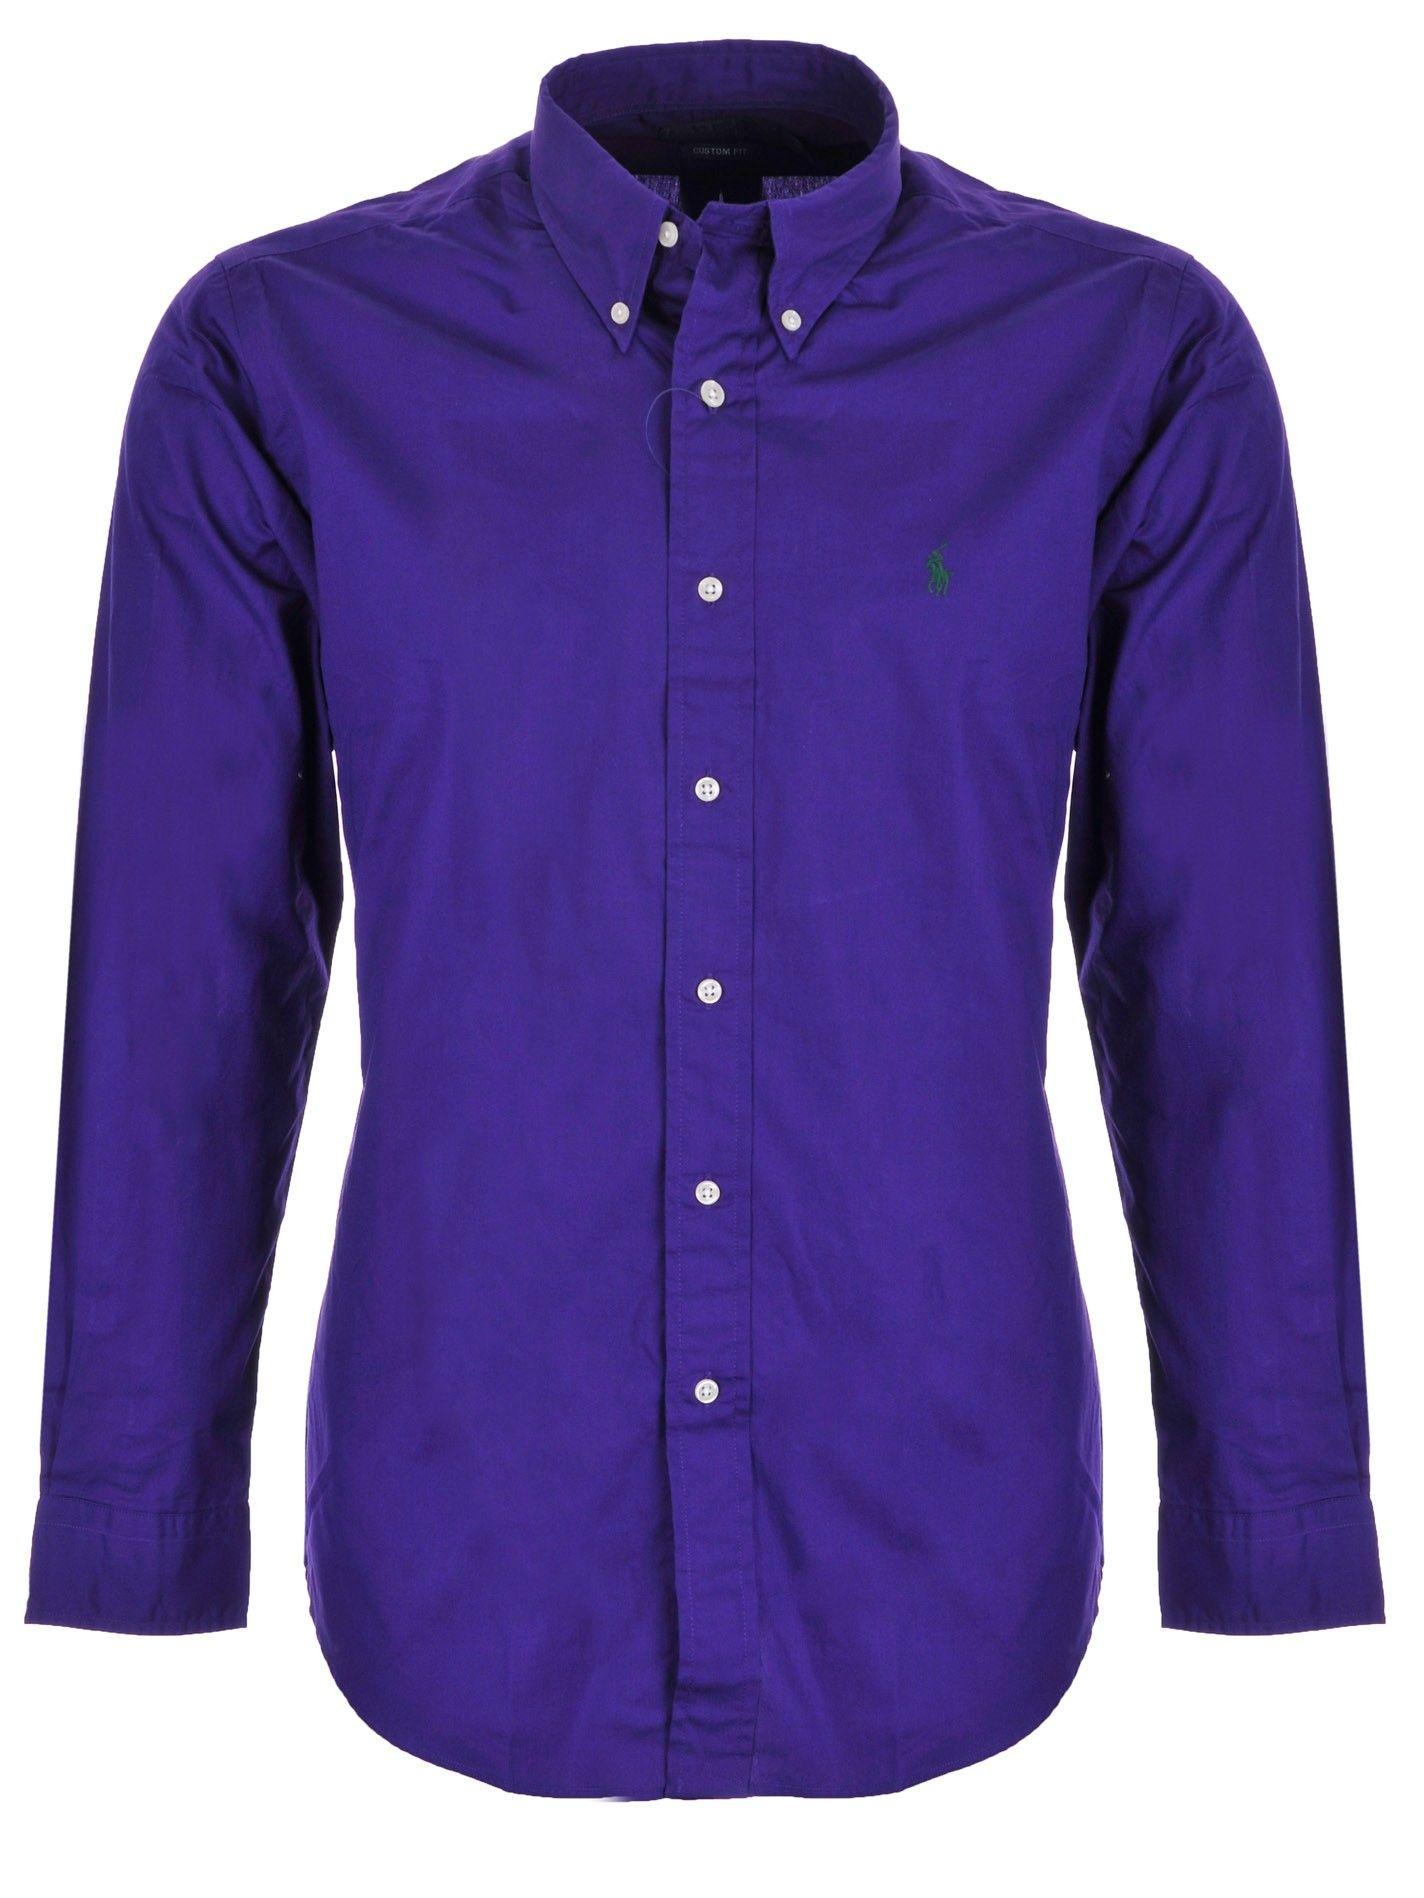 Camiseta de Hombre Baratos en Rebajas, Tinta Azul, Algodon, 2017, M Ralph Lauren